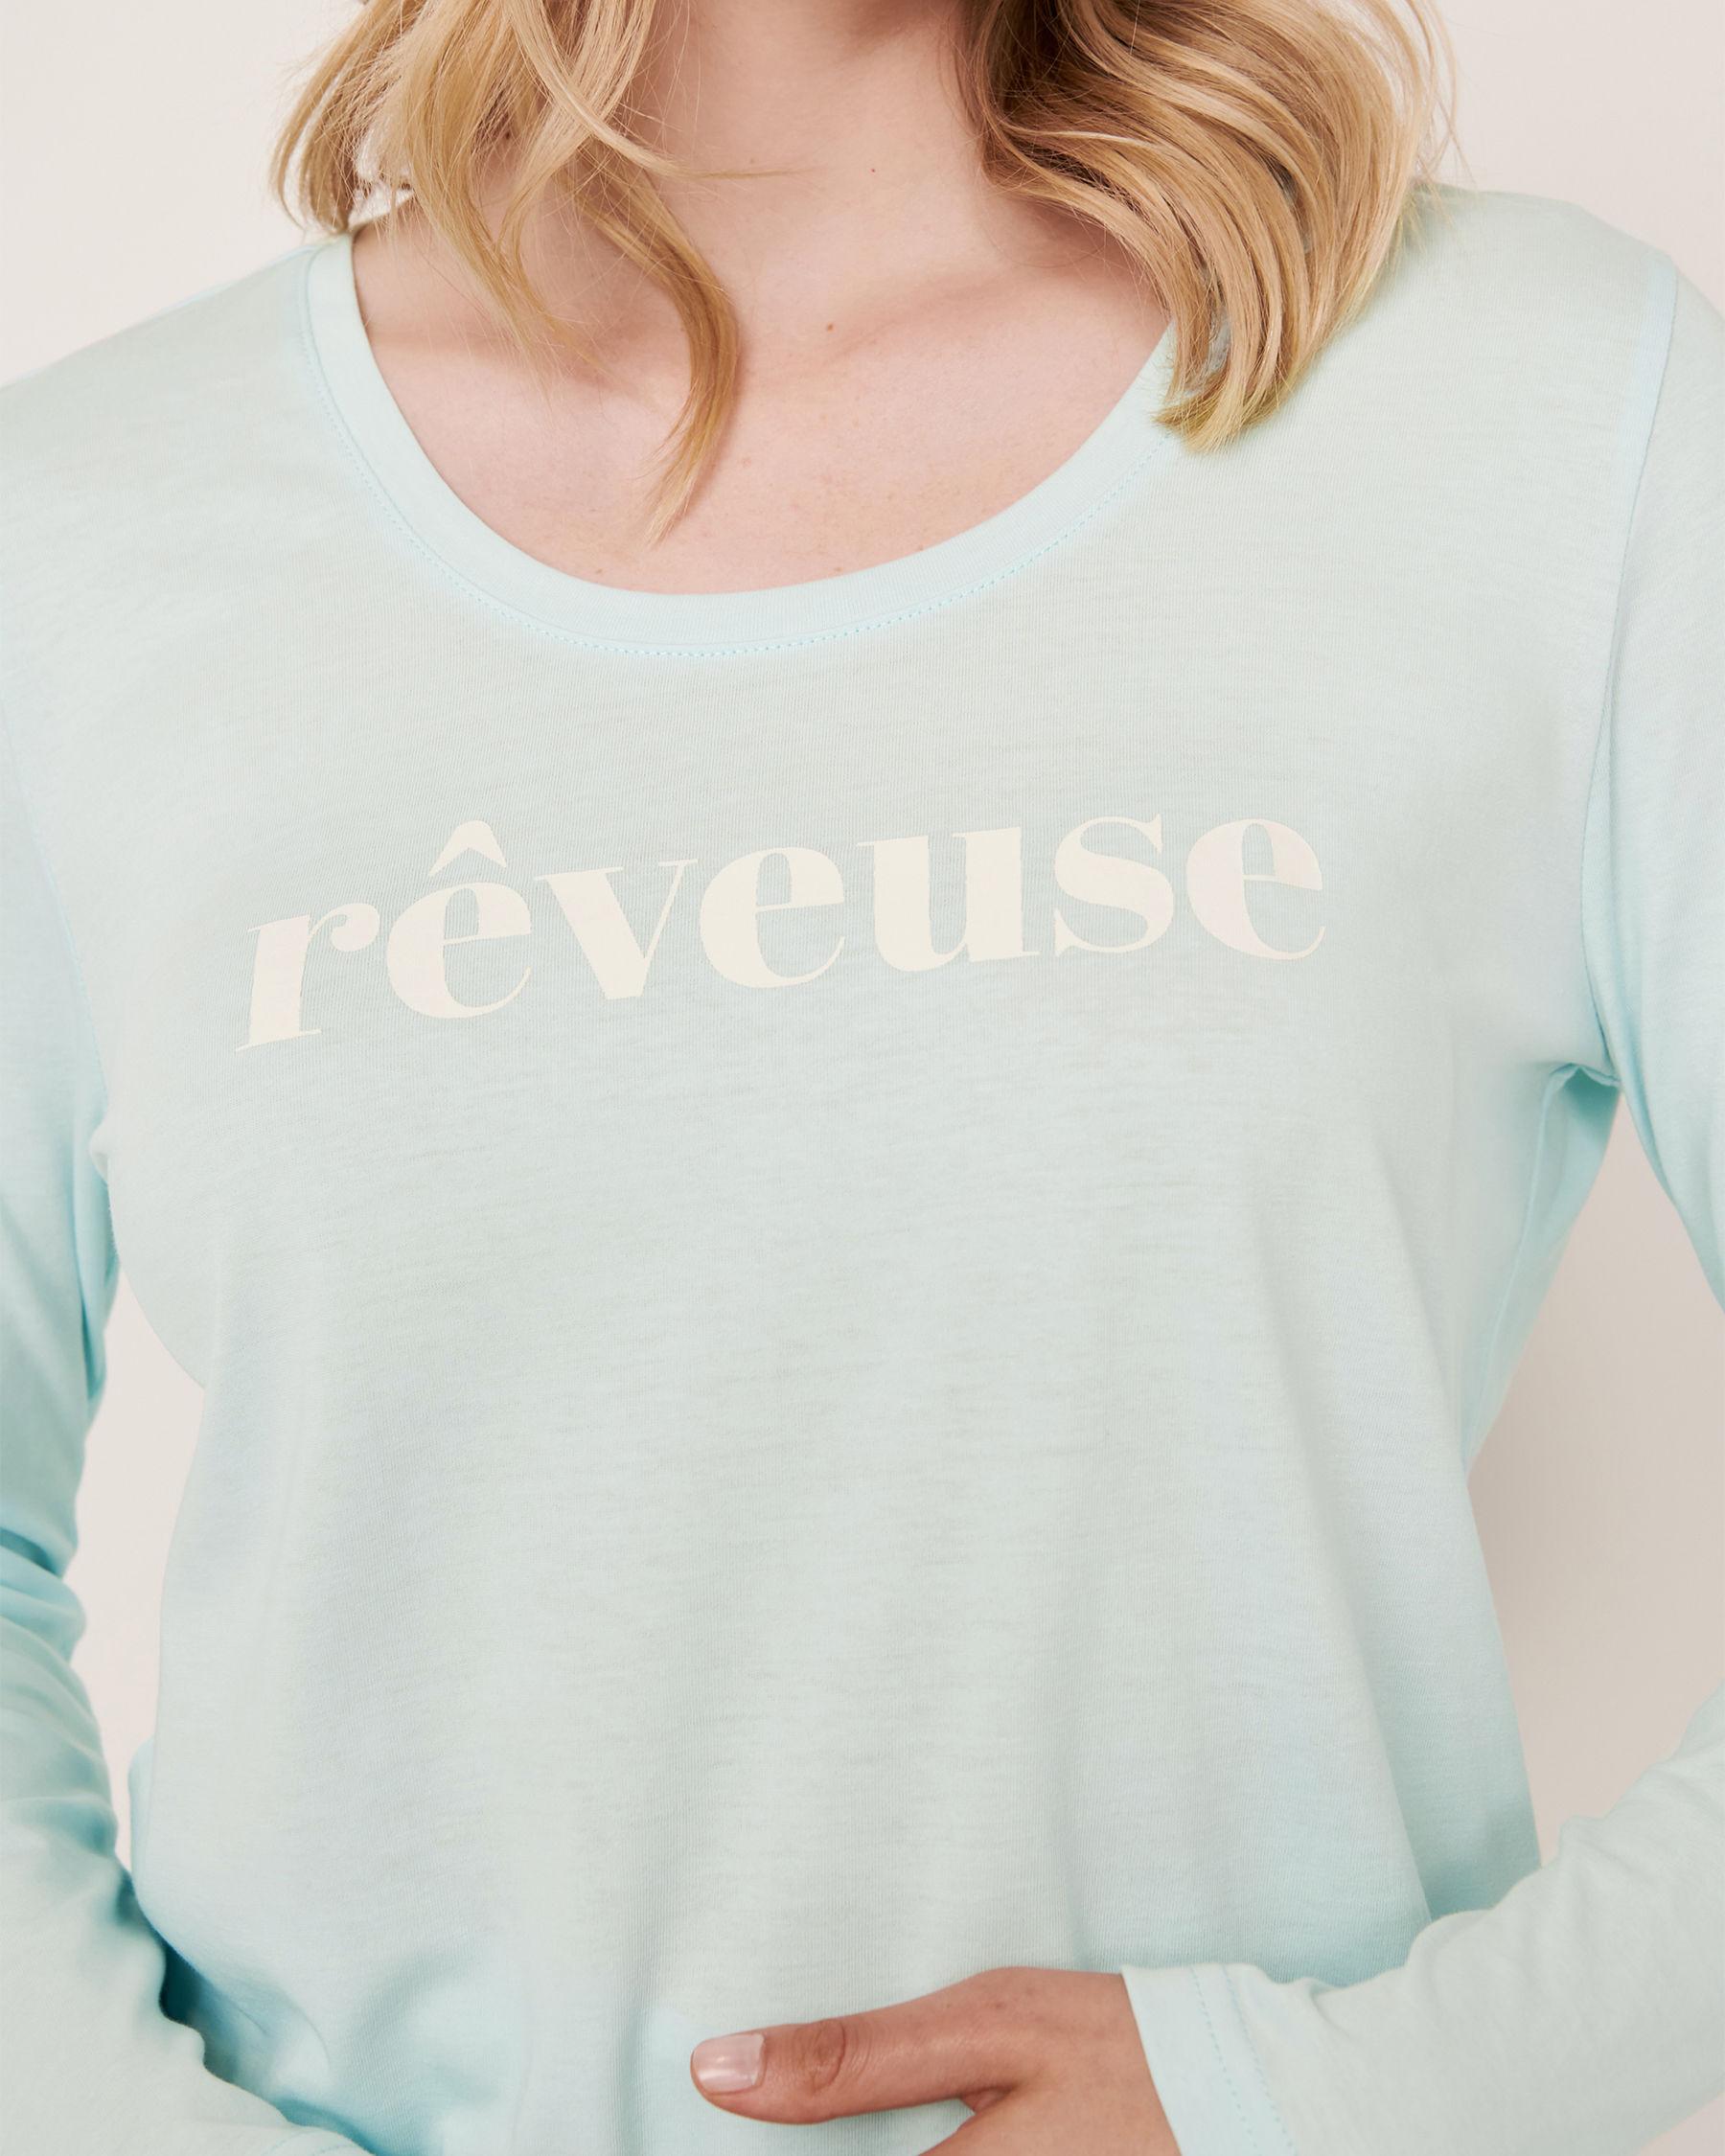 LA VIE EN ROSE Scoop Neck Long Sleeve Shirt Blue glow 40100169 - View3